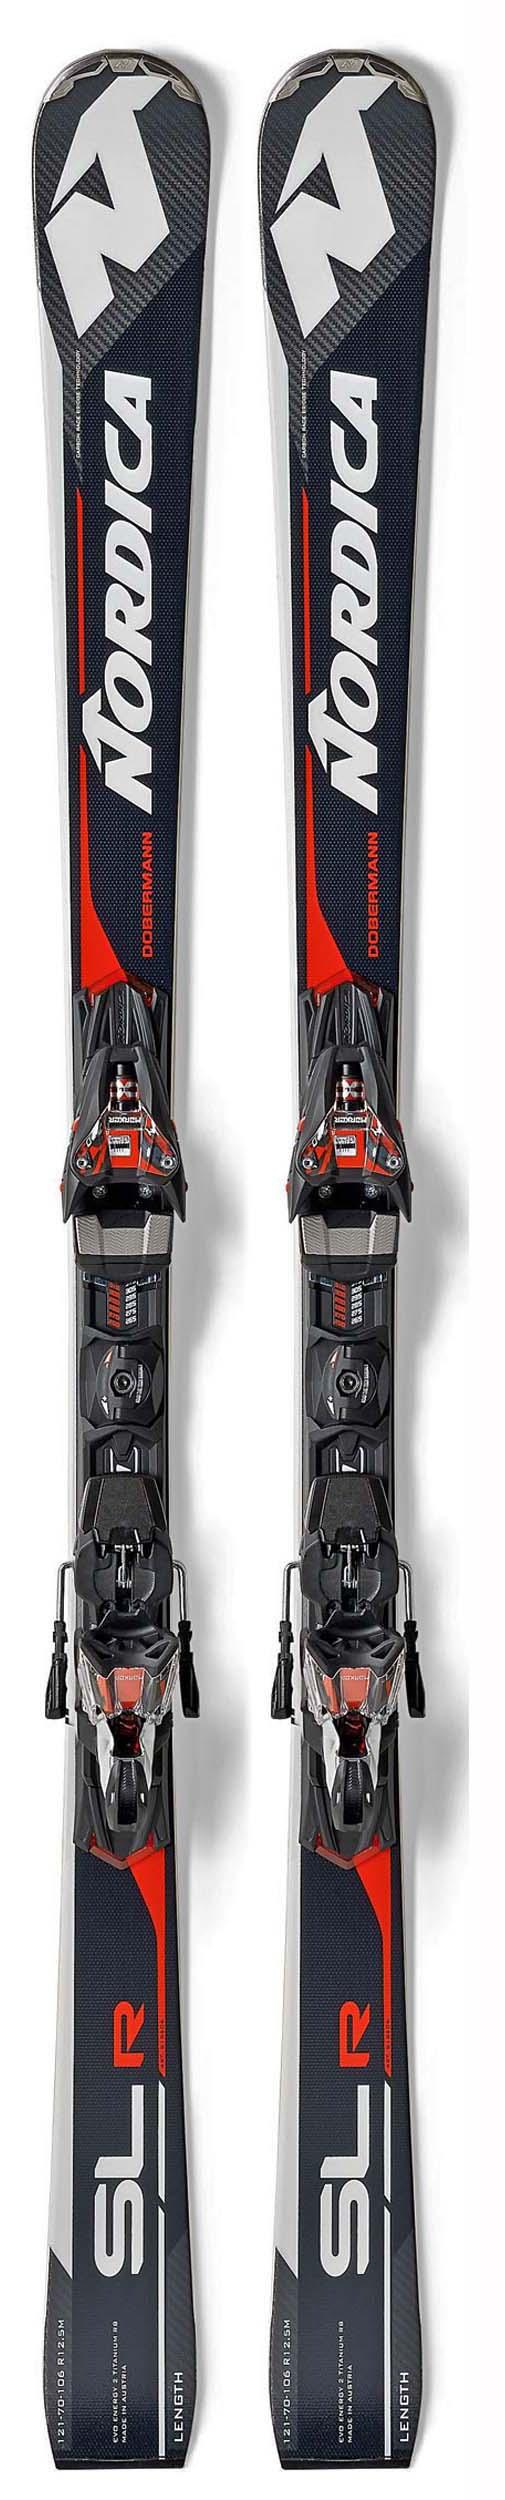 Nordica 2018 Dobermann SLR RB EVO Skis w/X-Cell Evo 12 Bindings NEW !! 160cm